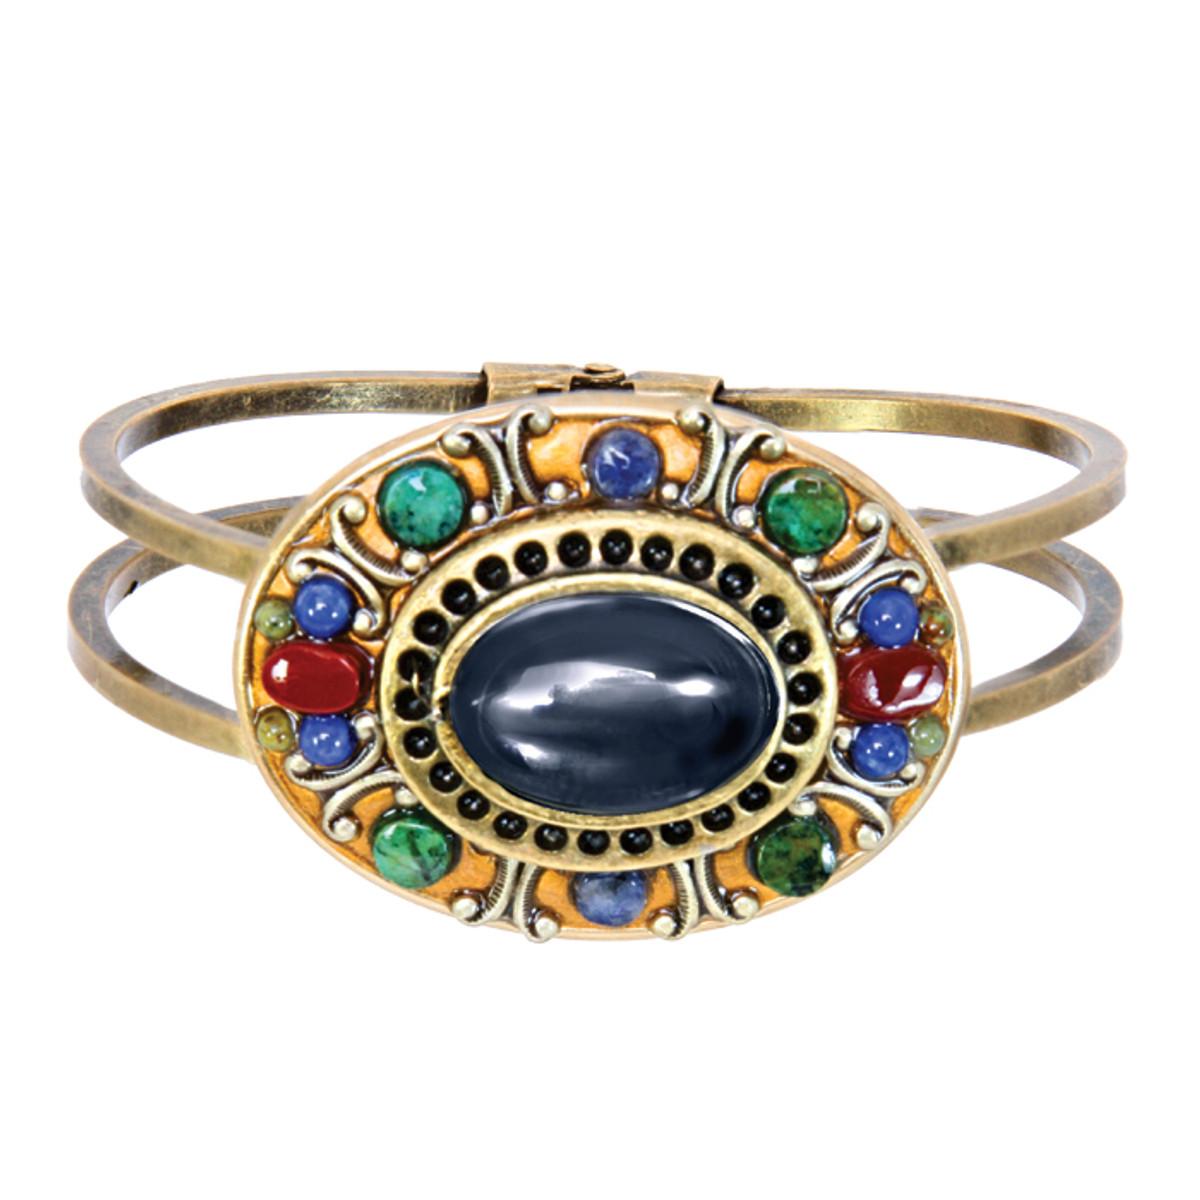 Michal Golan Jewelry Durango Bangle